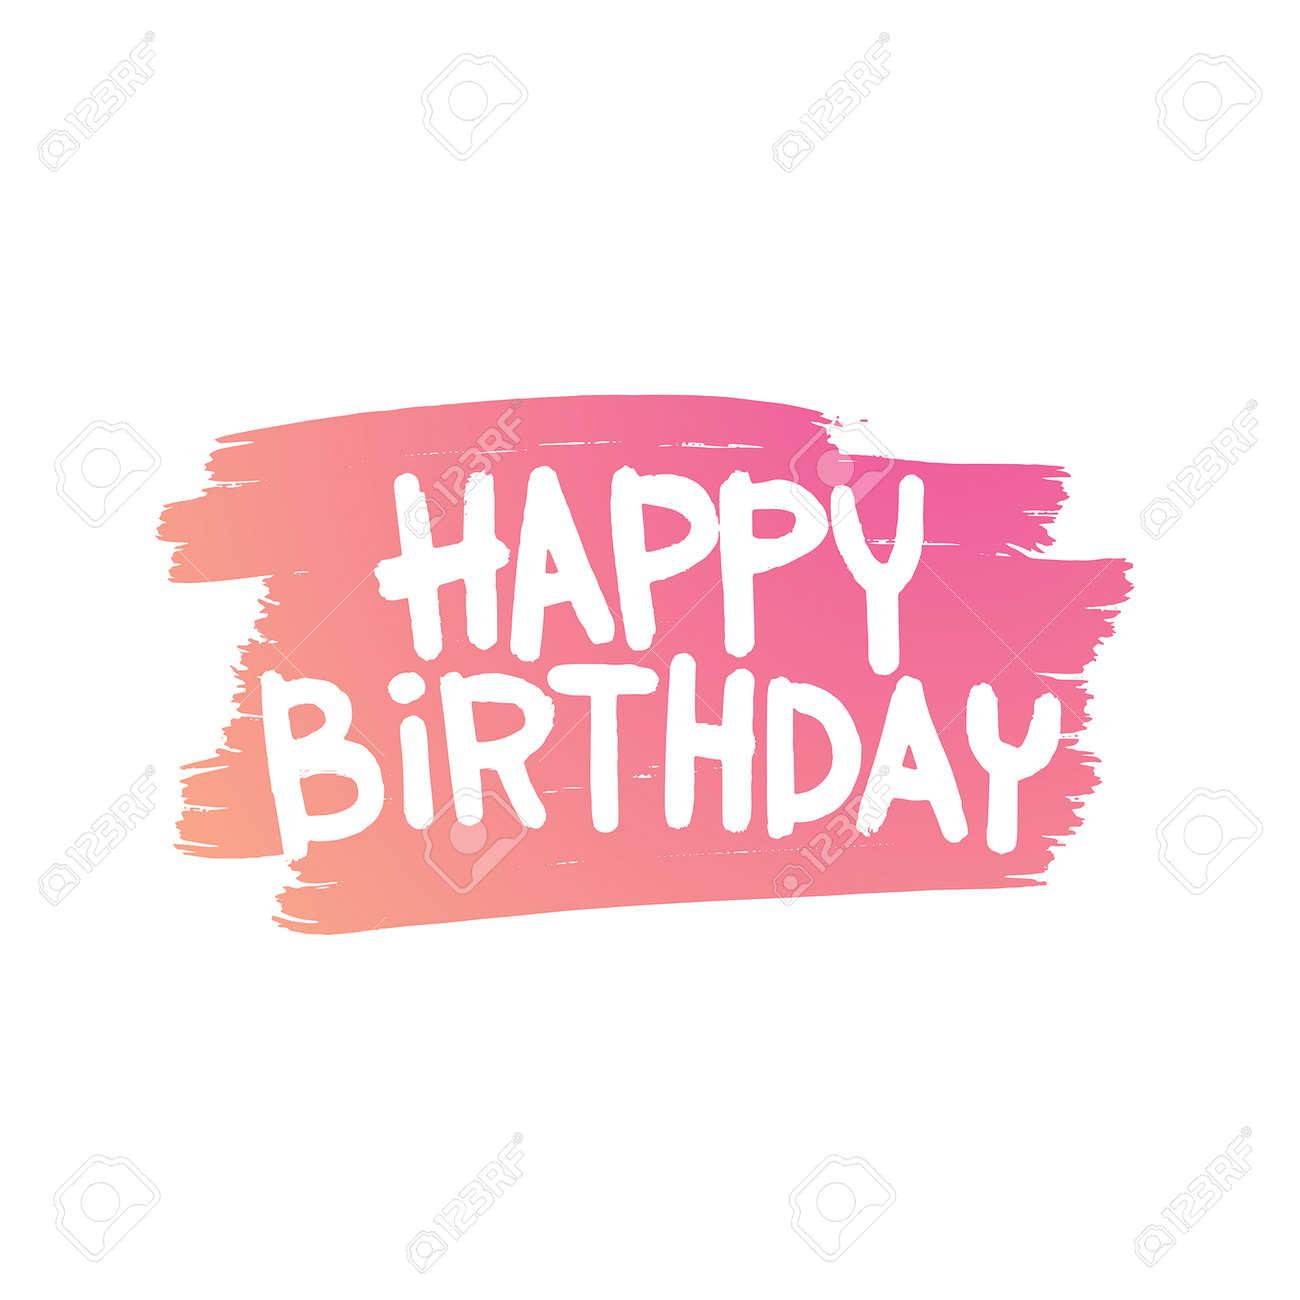 Happy Birthday Card illustration. Happy Birthday background. Happy Birthday Card design invitation. Happy Birthday Card poster. Happy Birthday Card party - 53359838